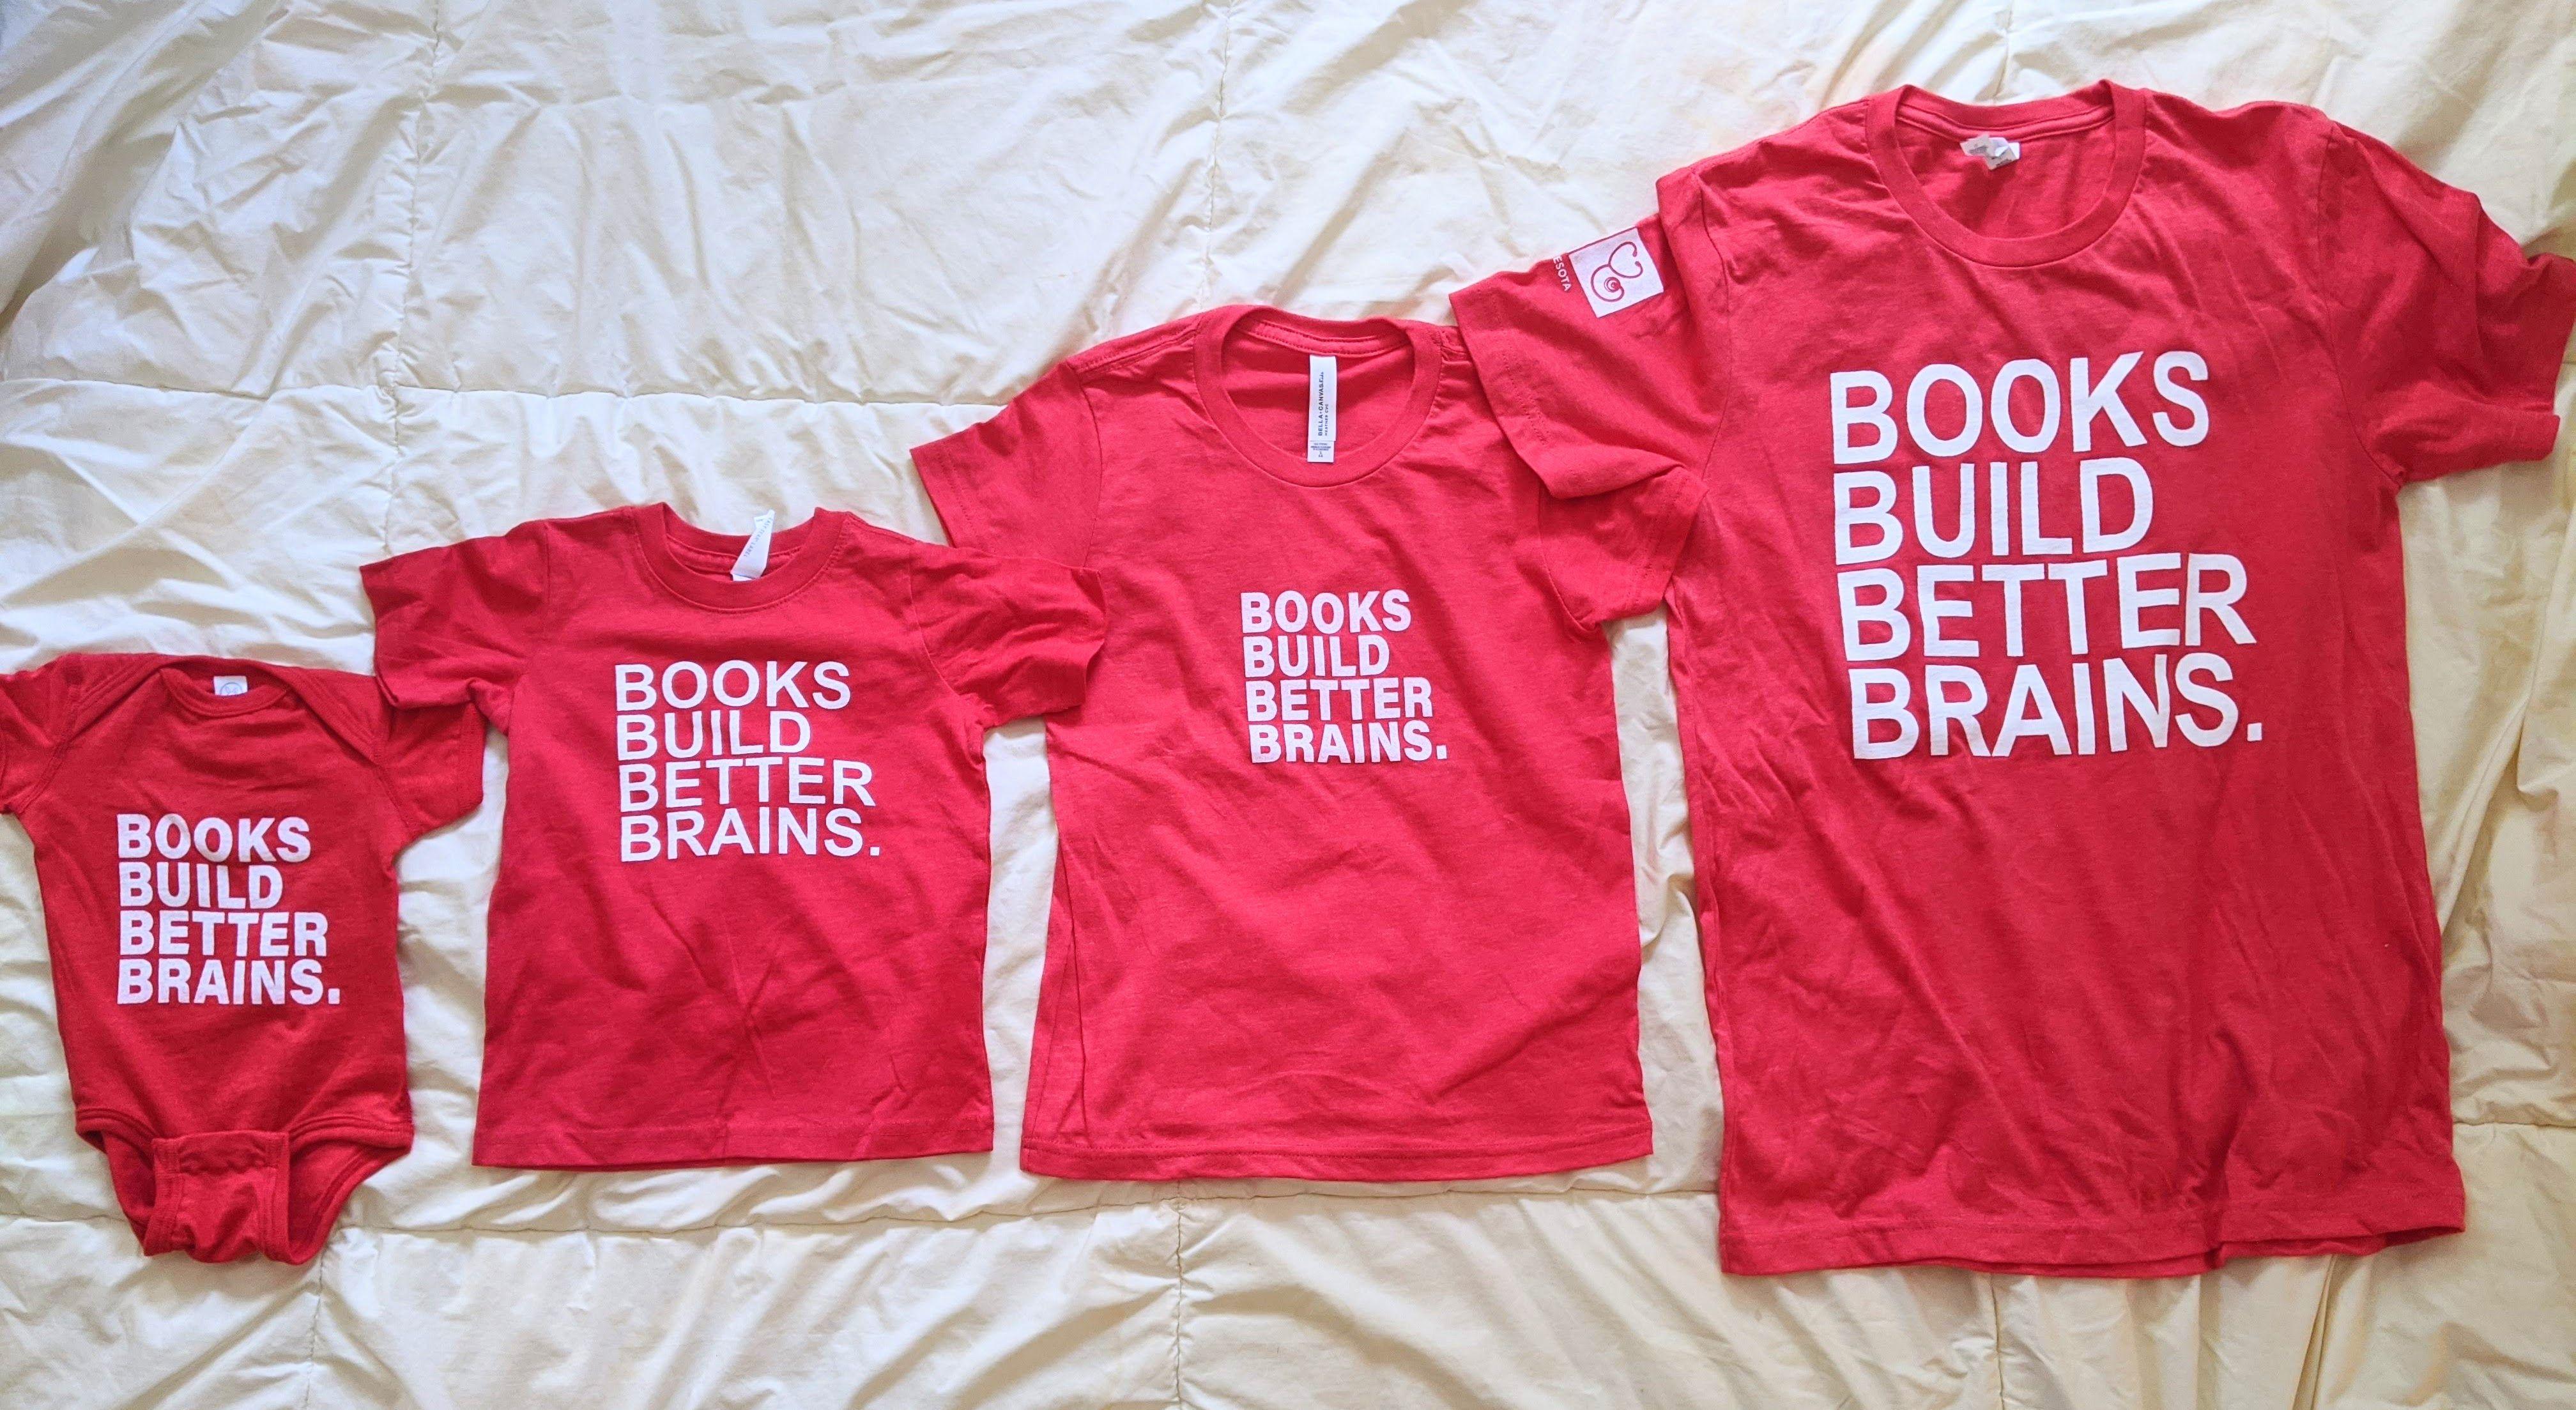 Books Build Better Brains Shirts & Onesies